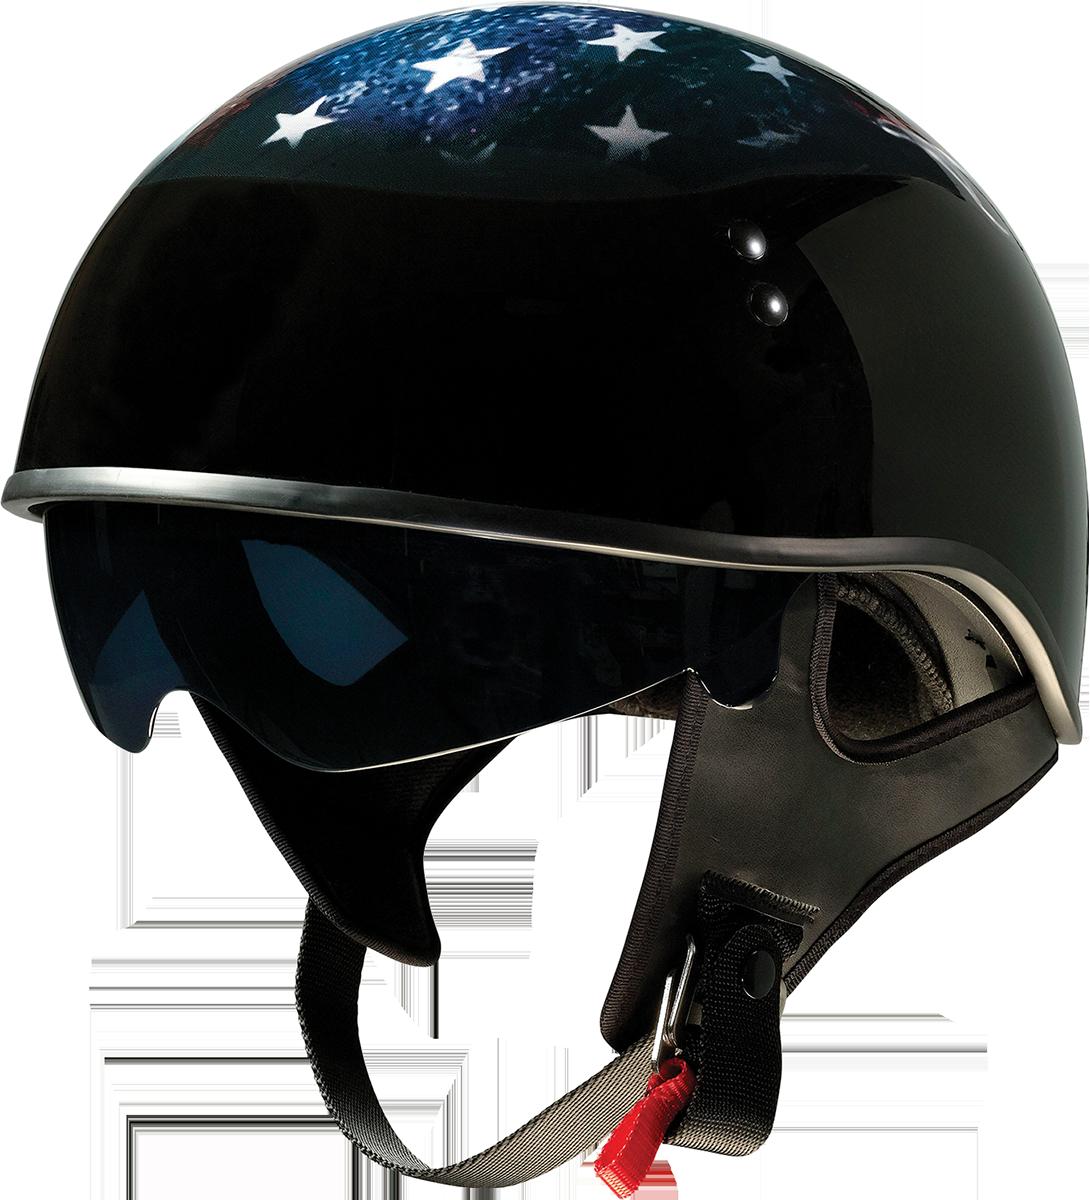 Z1R Vagrant USA Skull Unisex Adult Motorcycle Riding Street Half Helmet